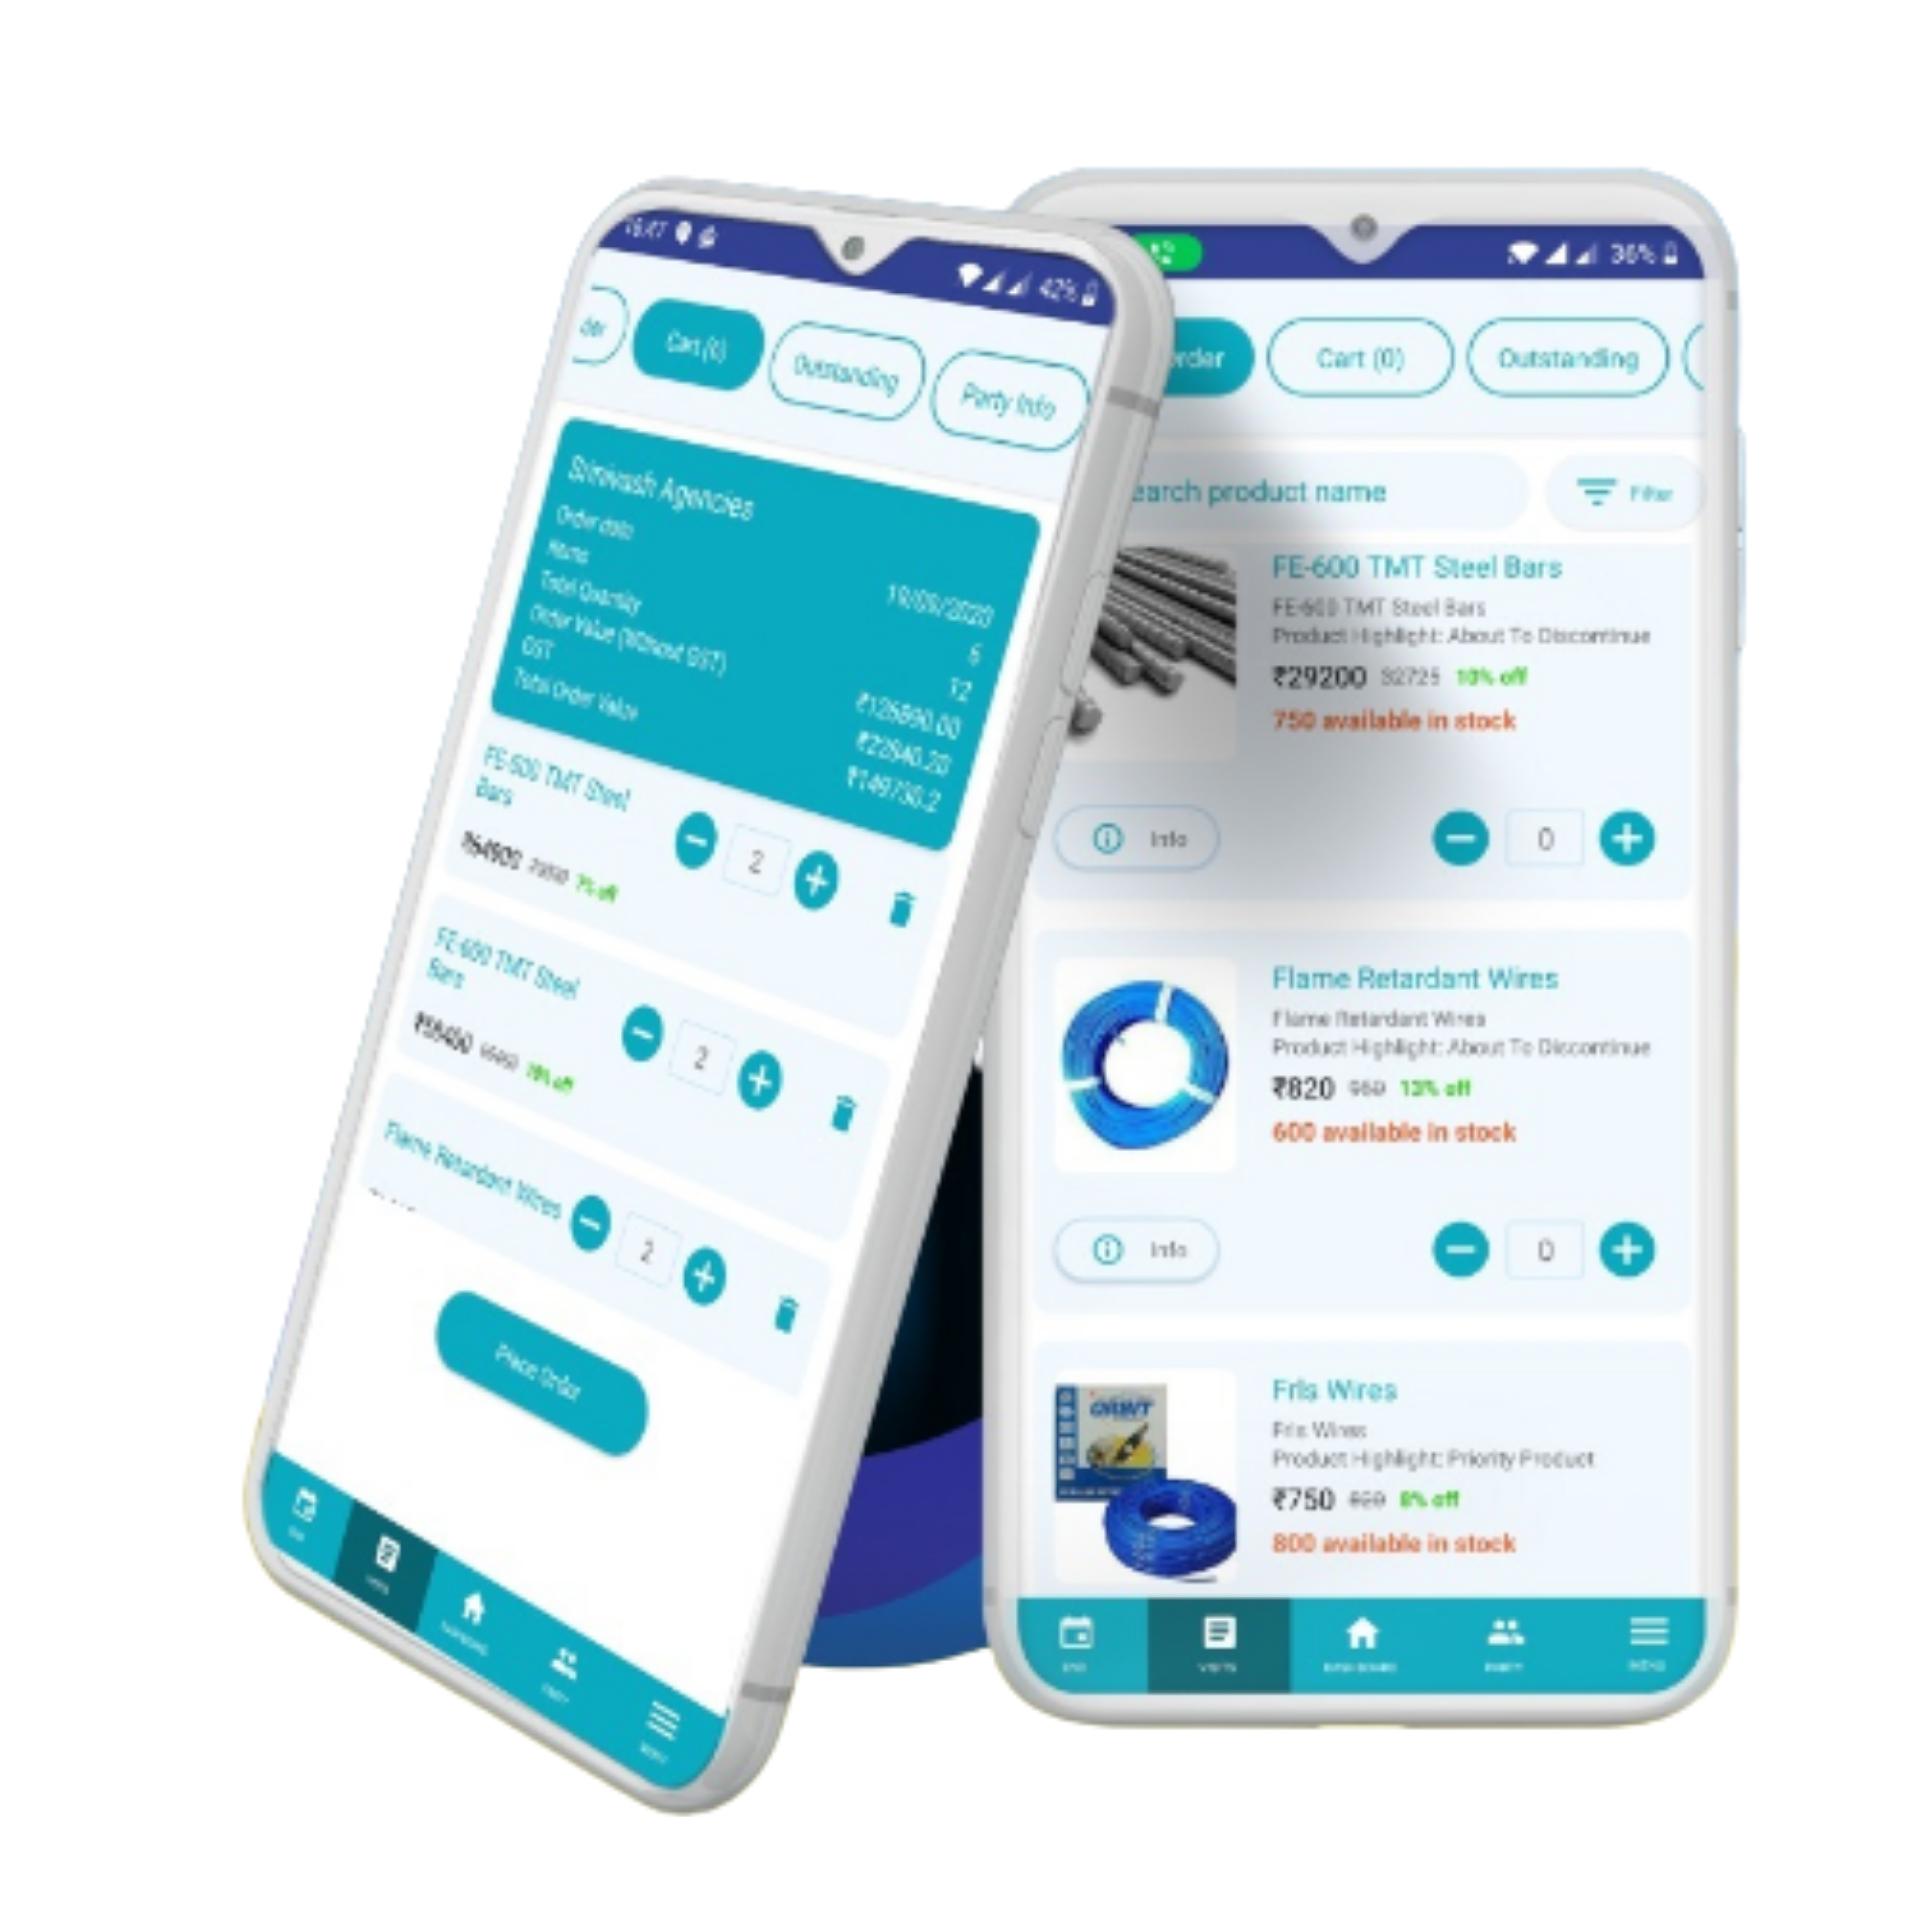 sfa app 10